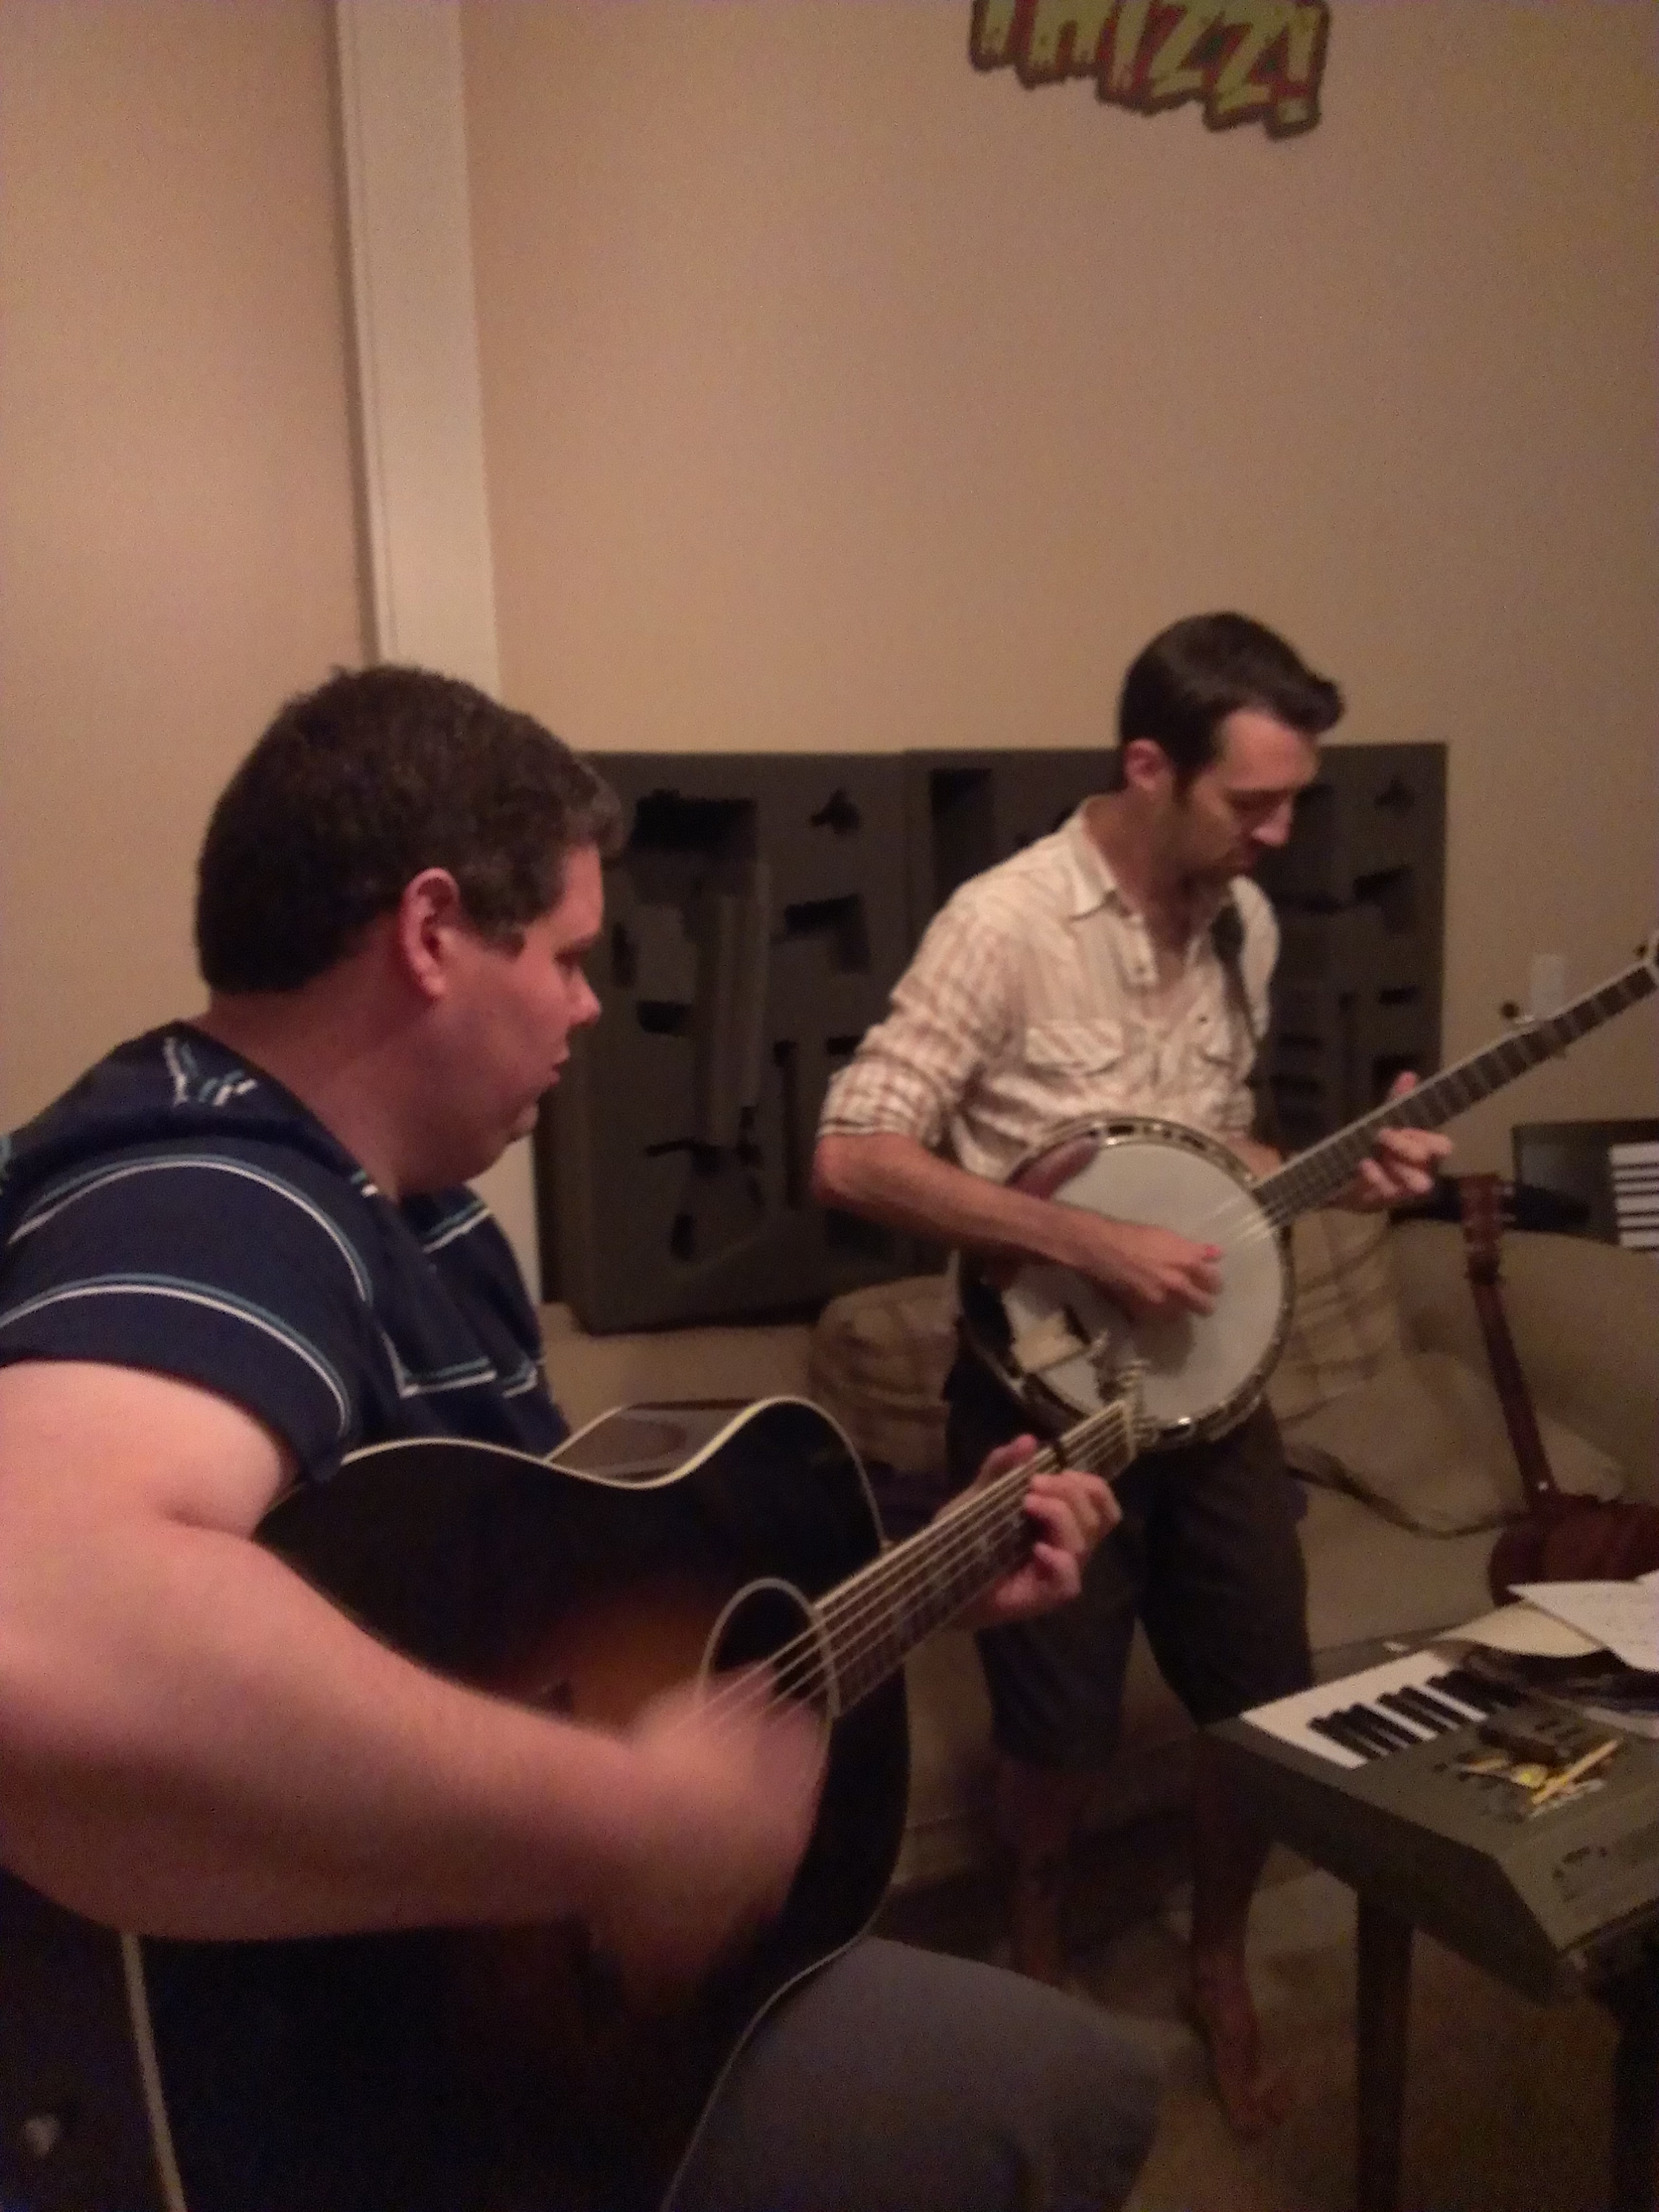 More practice: John & Kyle.